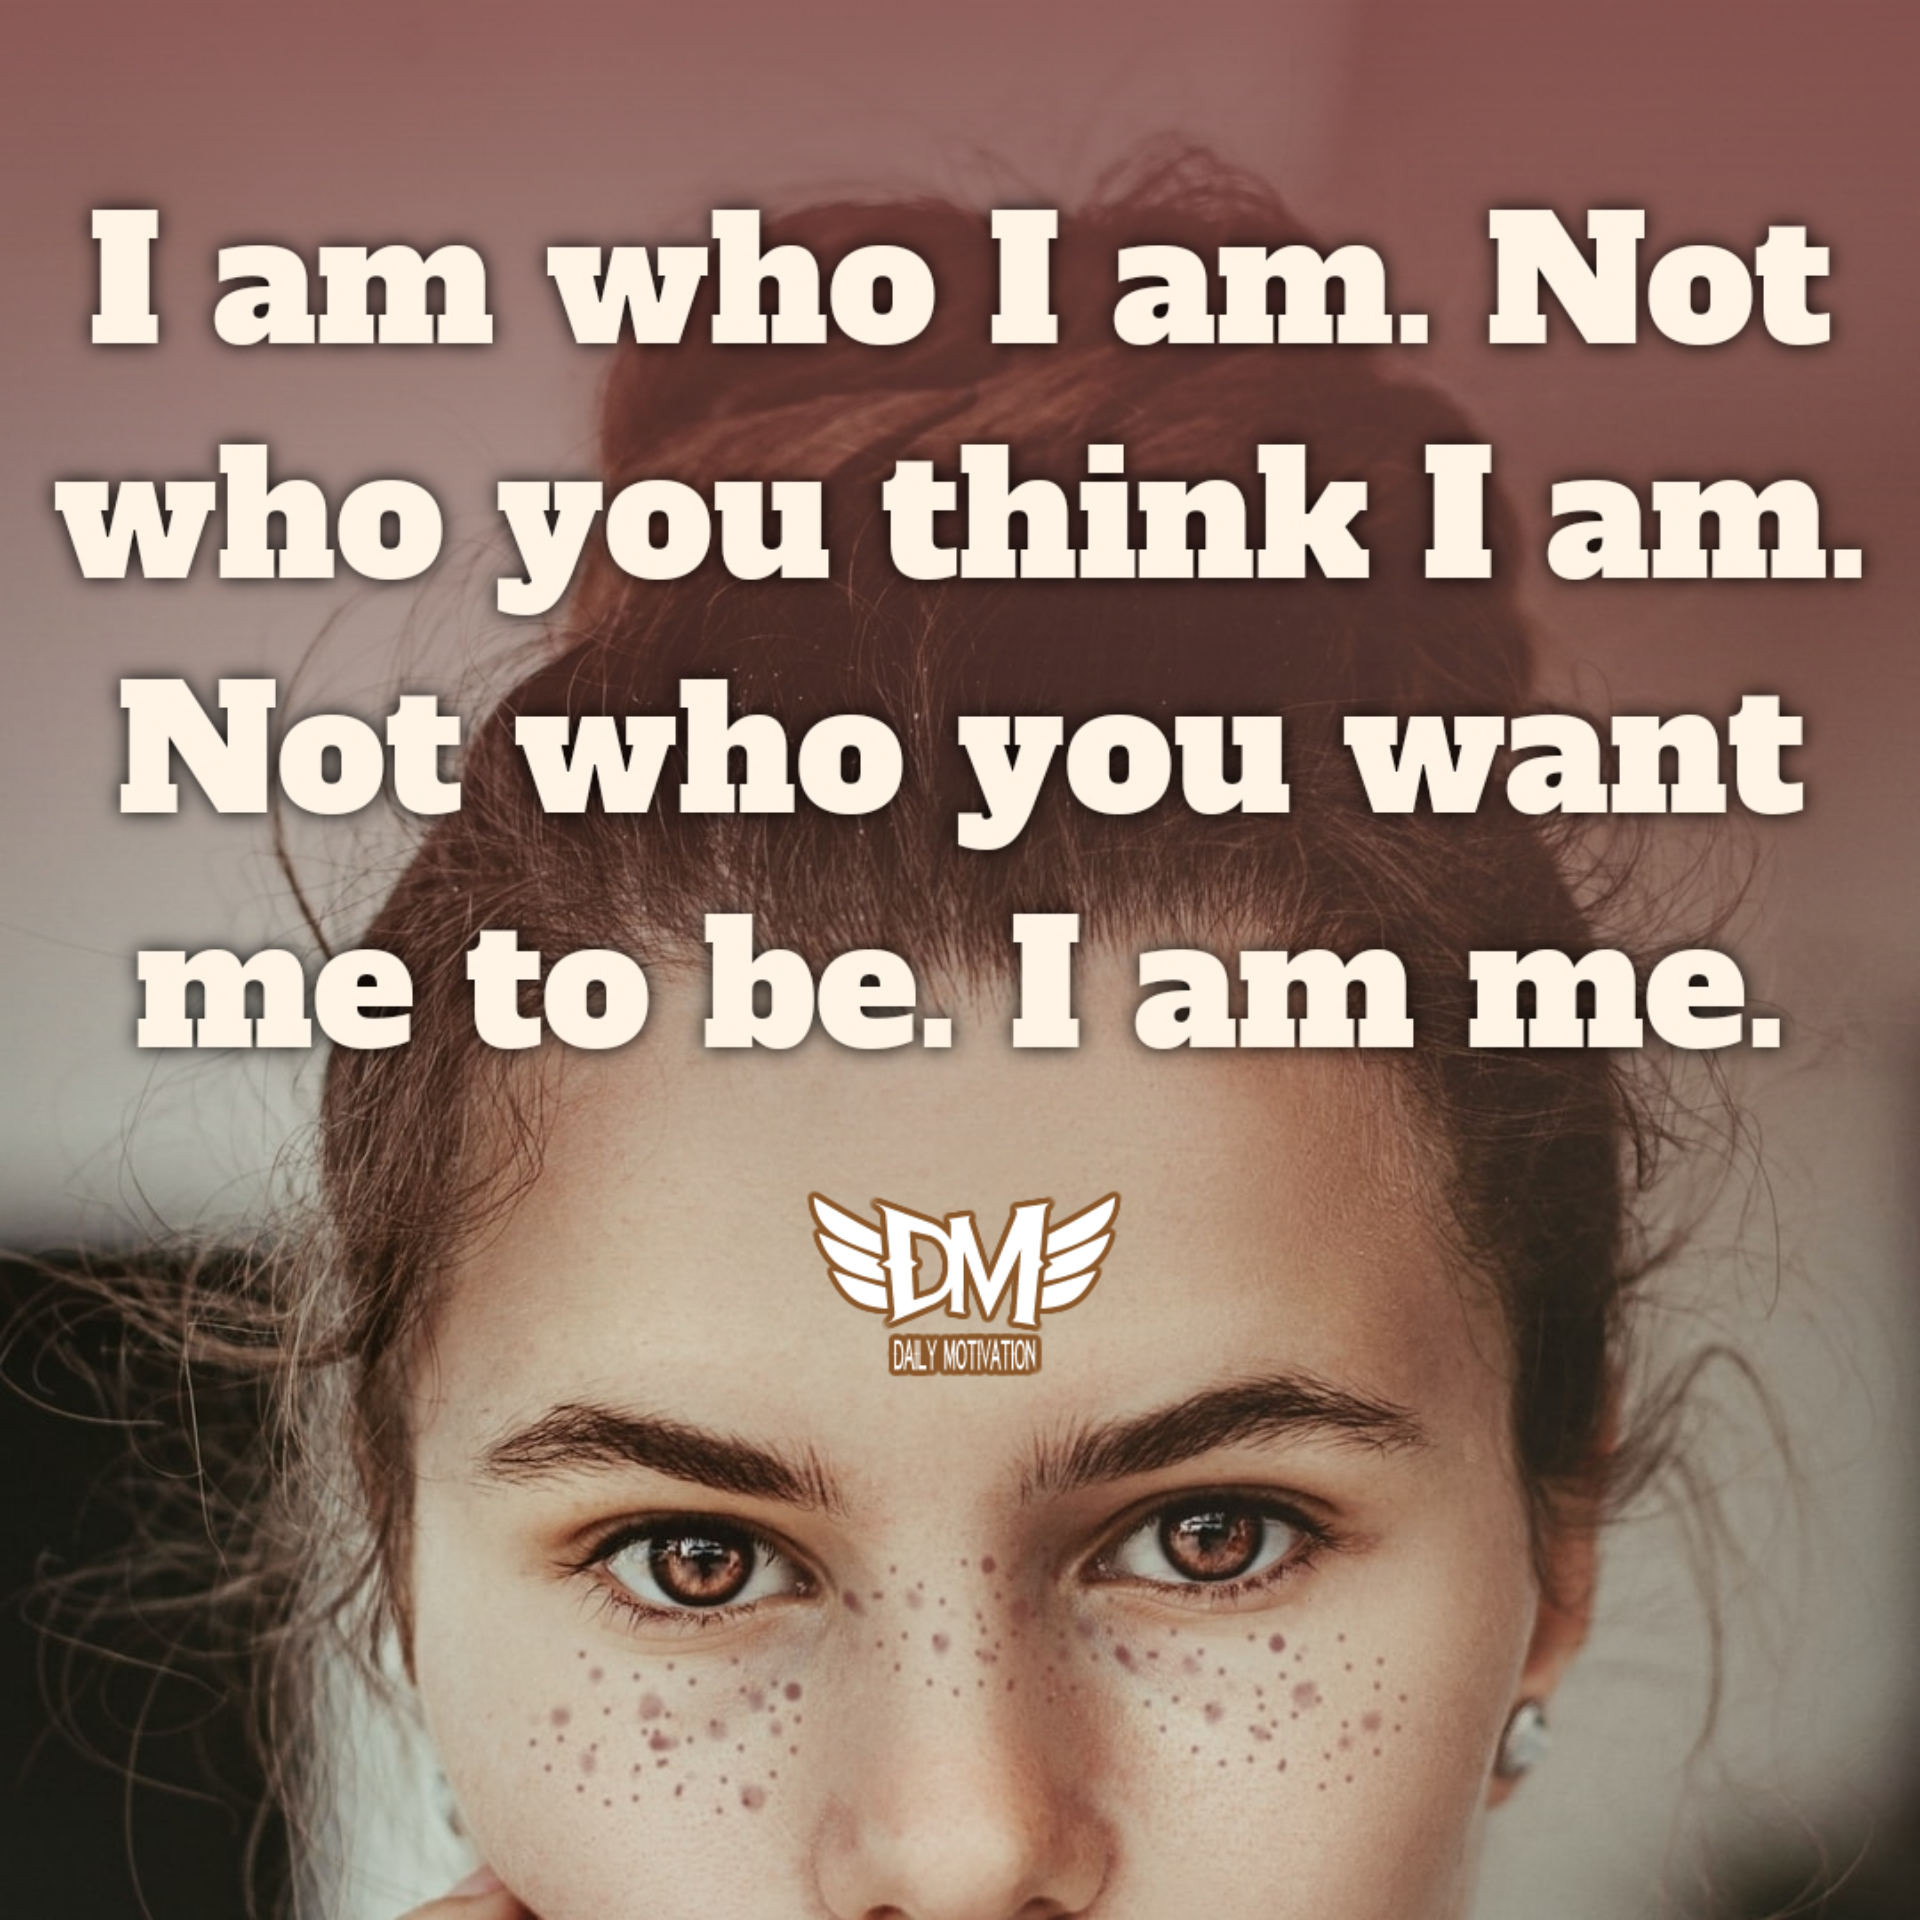 "I am who I am. Not ""'1' ,w oou think I am. 1:"" who you want . q . K '. ' l .' ~ 'I ' '.| 0 ' I . . .'.| g » . I ' .4 . r ' ' ! . ' ' r o A  I  f https://inspirational.ly"